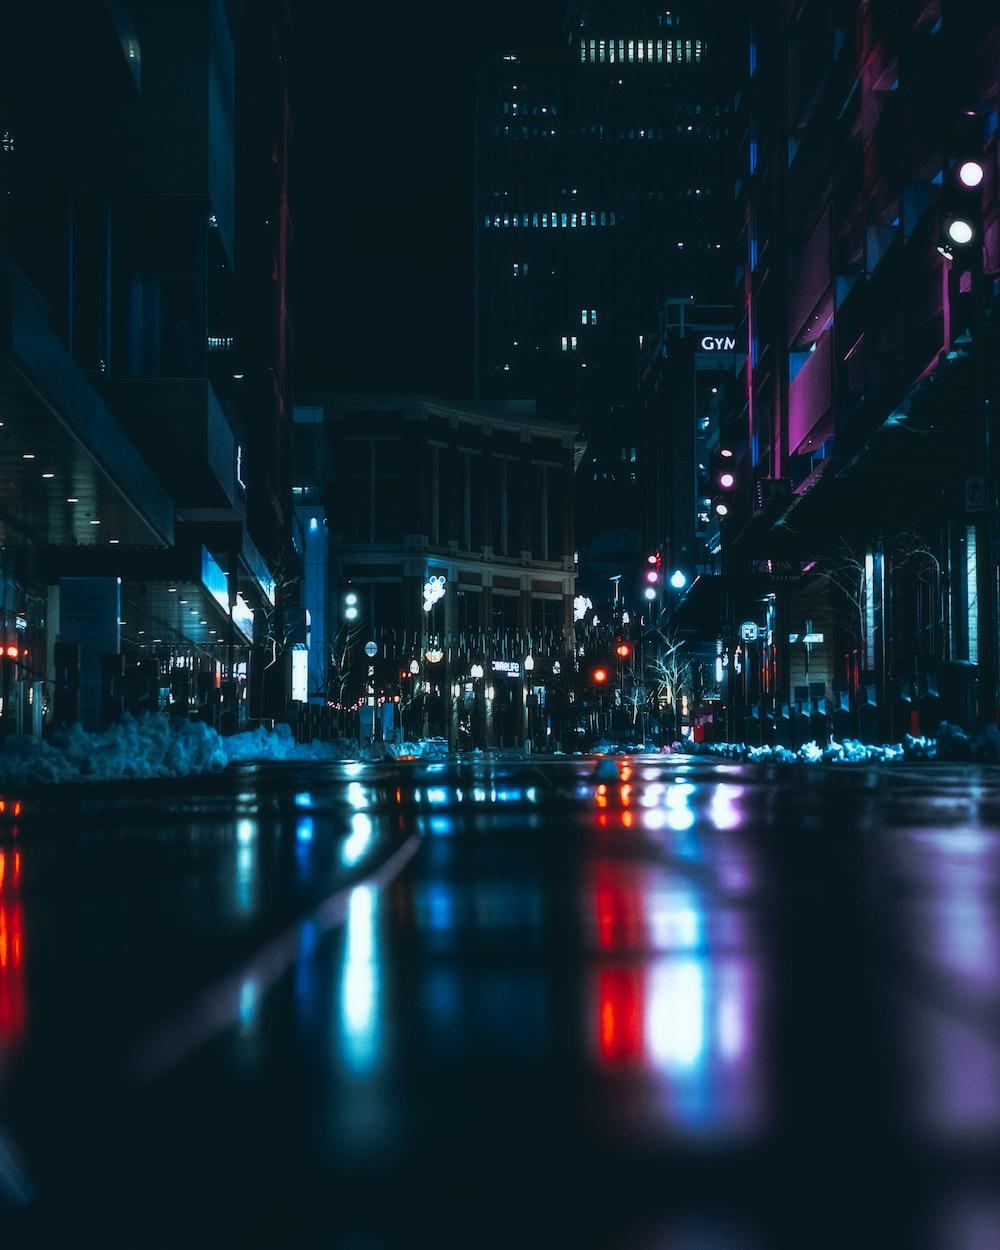 photograph of city at night